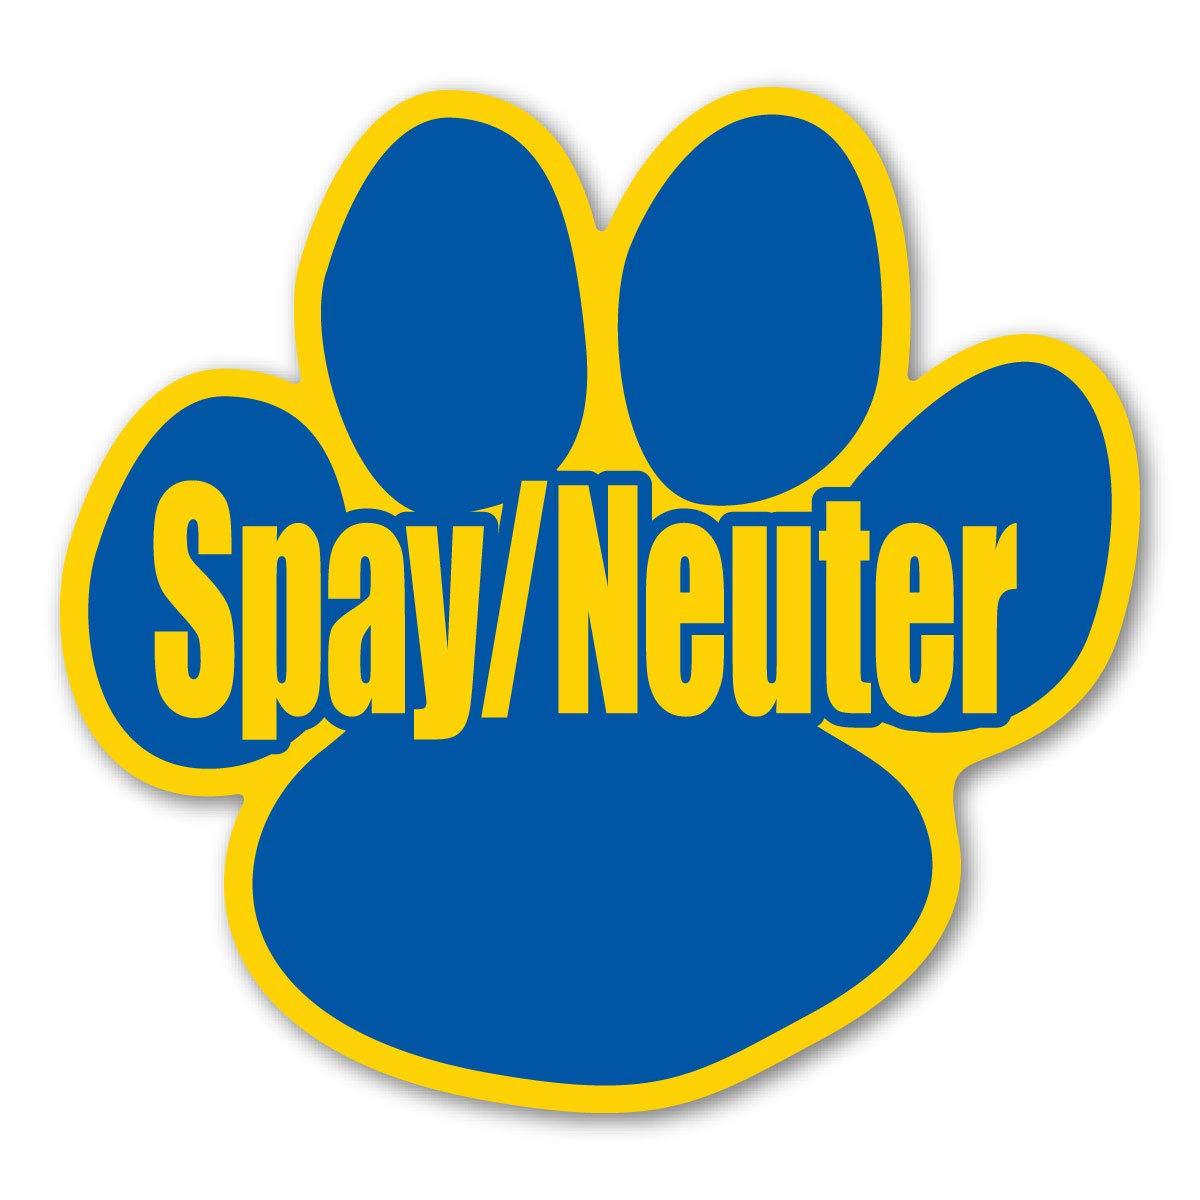 Spay/Neuter Your Pet Paw Magnet